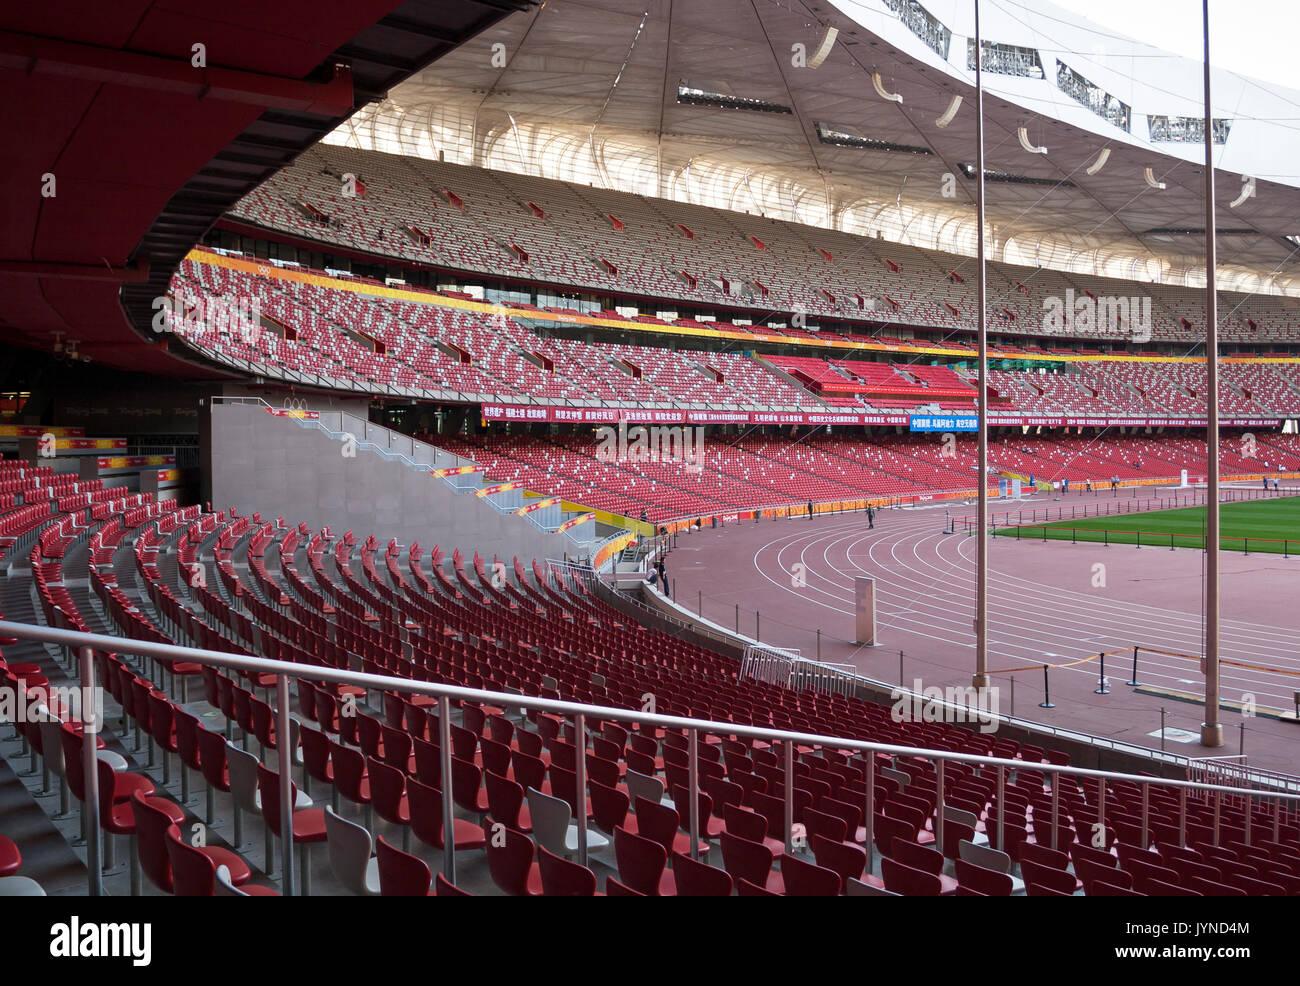 Olympic stadium beijing track stock photos olympic for The bird s nest stadium